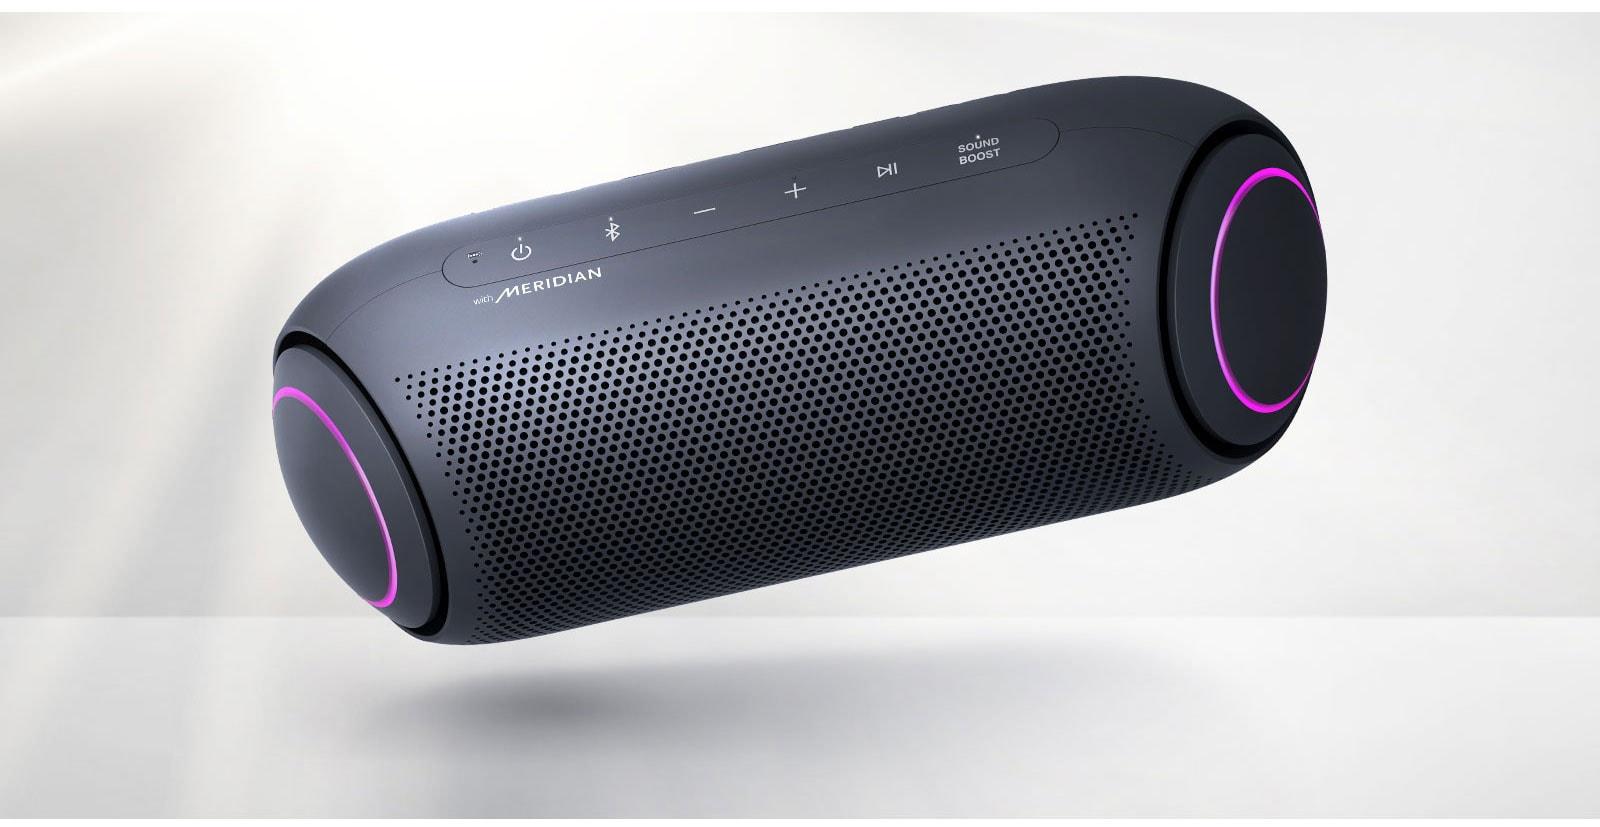 Lg Xboom Go Pl7 Portable Bluetooth Speaker With Meridian Audio Technology Pl7 Lg Usa